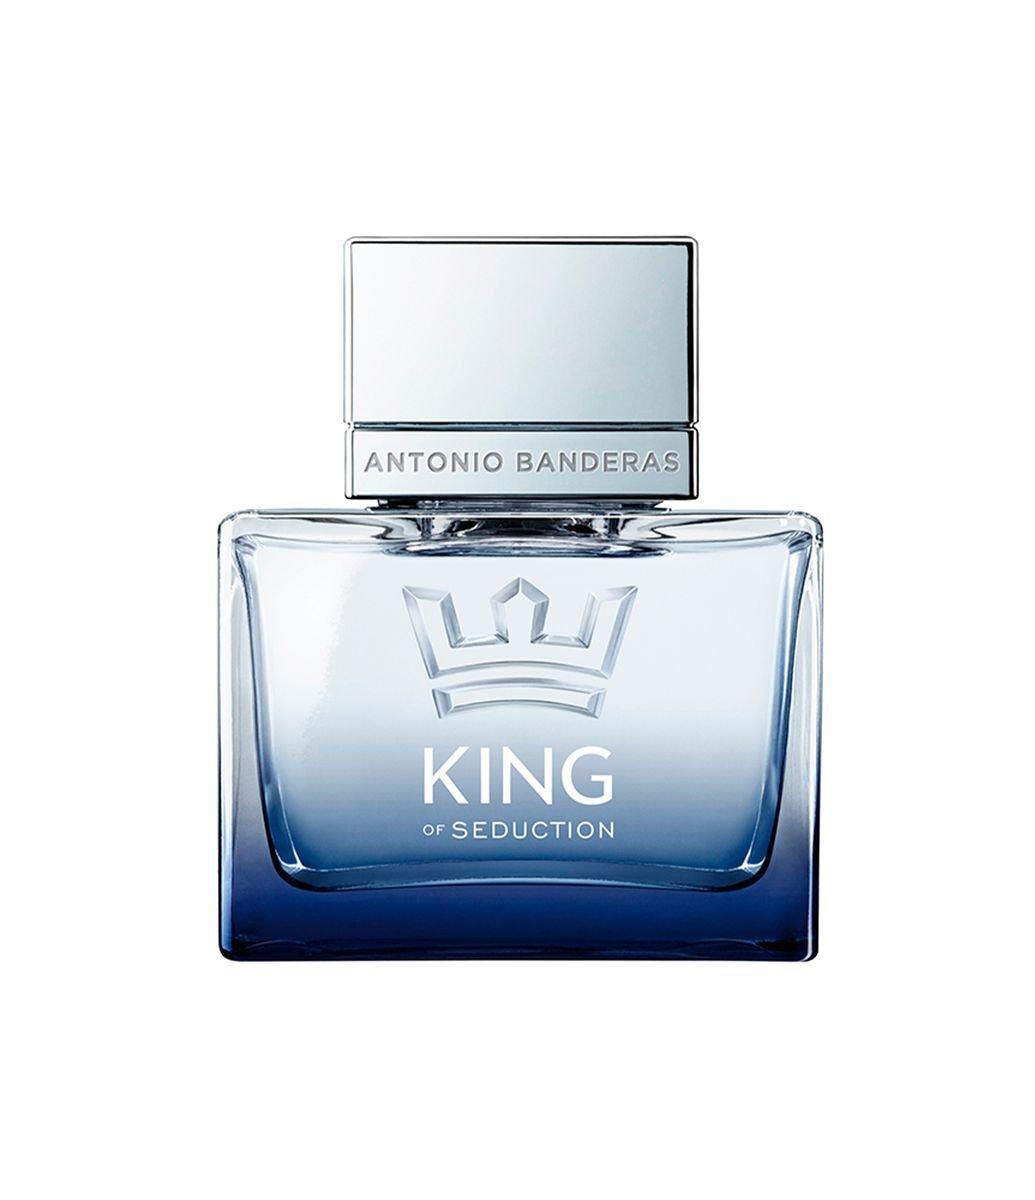 d6e43a82d Perfume Antonio Banderas King of Seduction Masculino Eau de Toilette ...